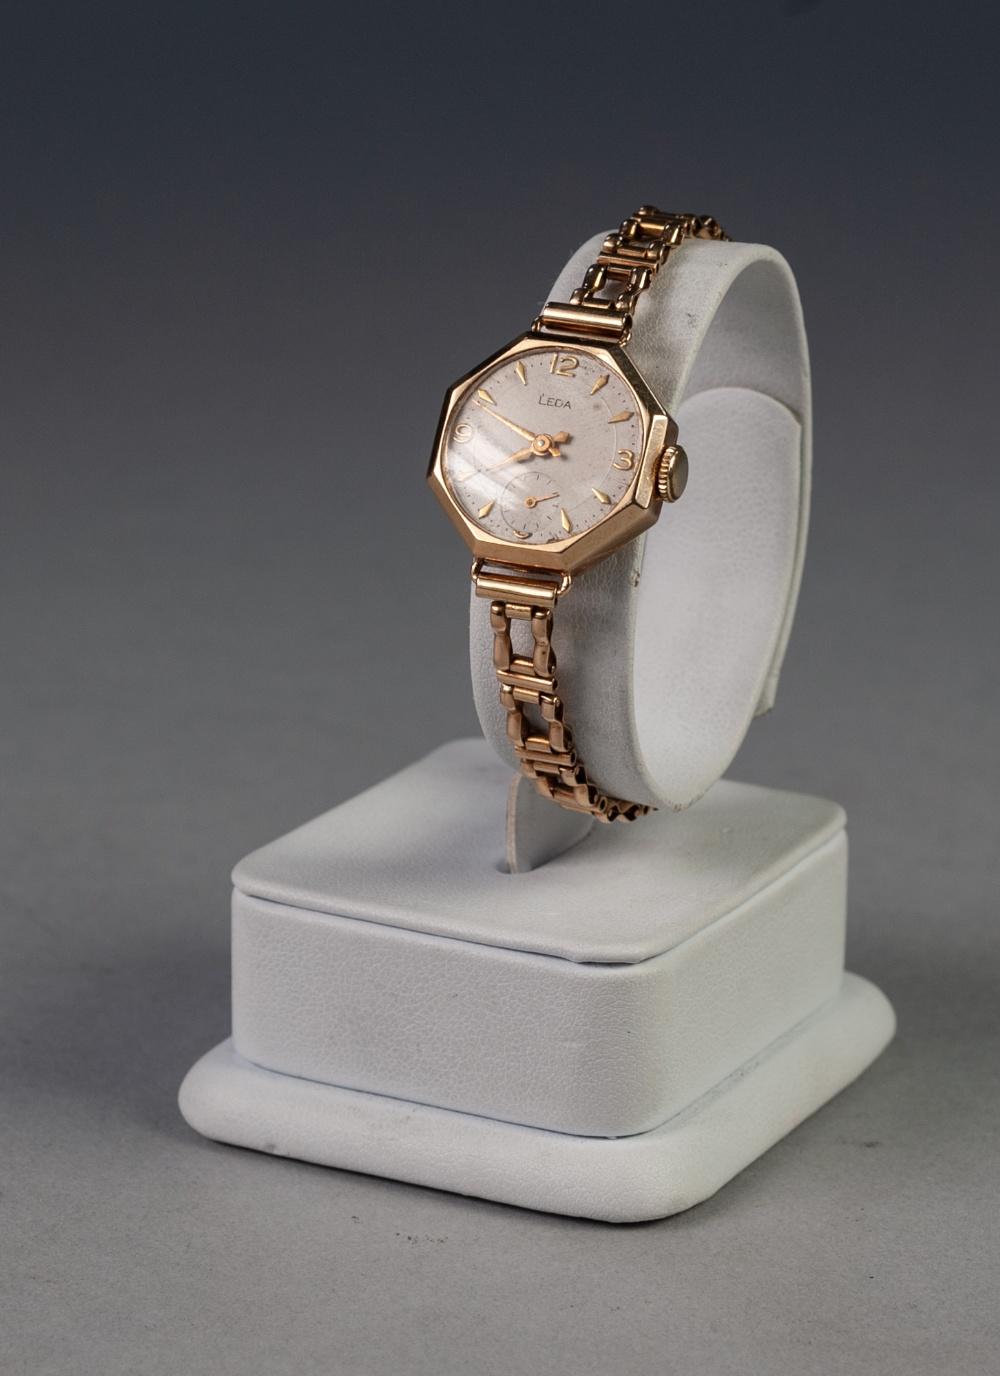 Lot 14 - 9ct GOLD CASED LADY'S LEDA WRIST WATCH, on 9ct gold linked bracelet, 15.0gms gross, in associated